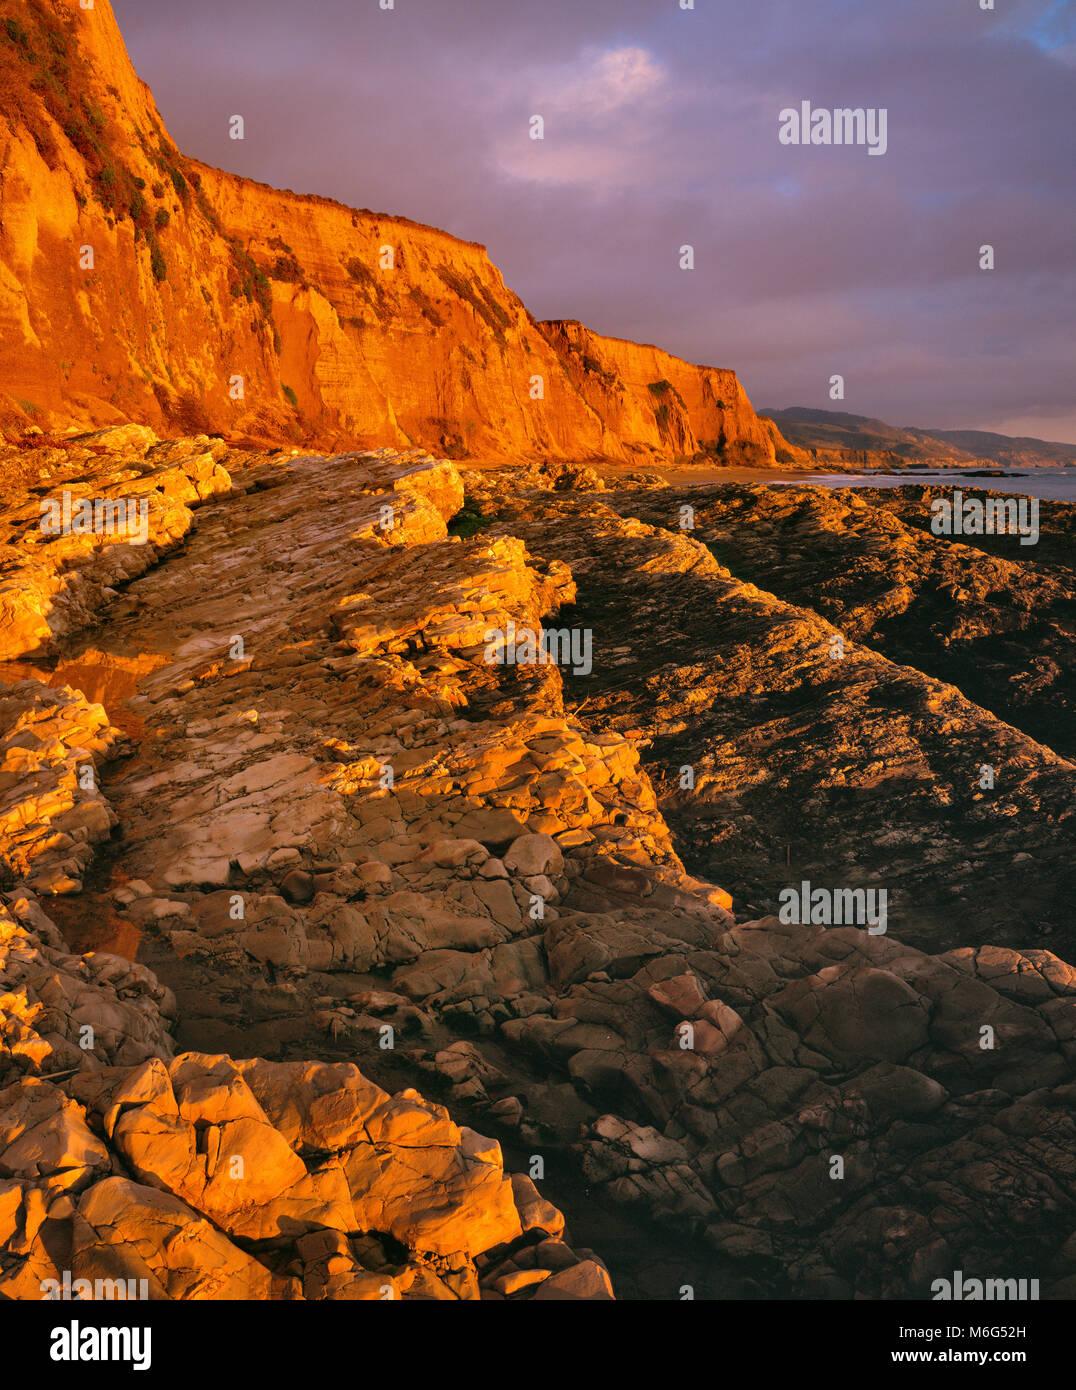 Sunset, Sculptured Beach, Point Reyes National Seashore, Marin County, California - Stock Image